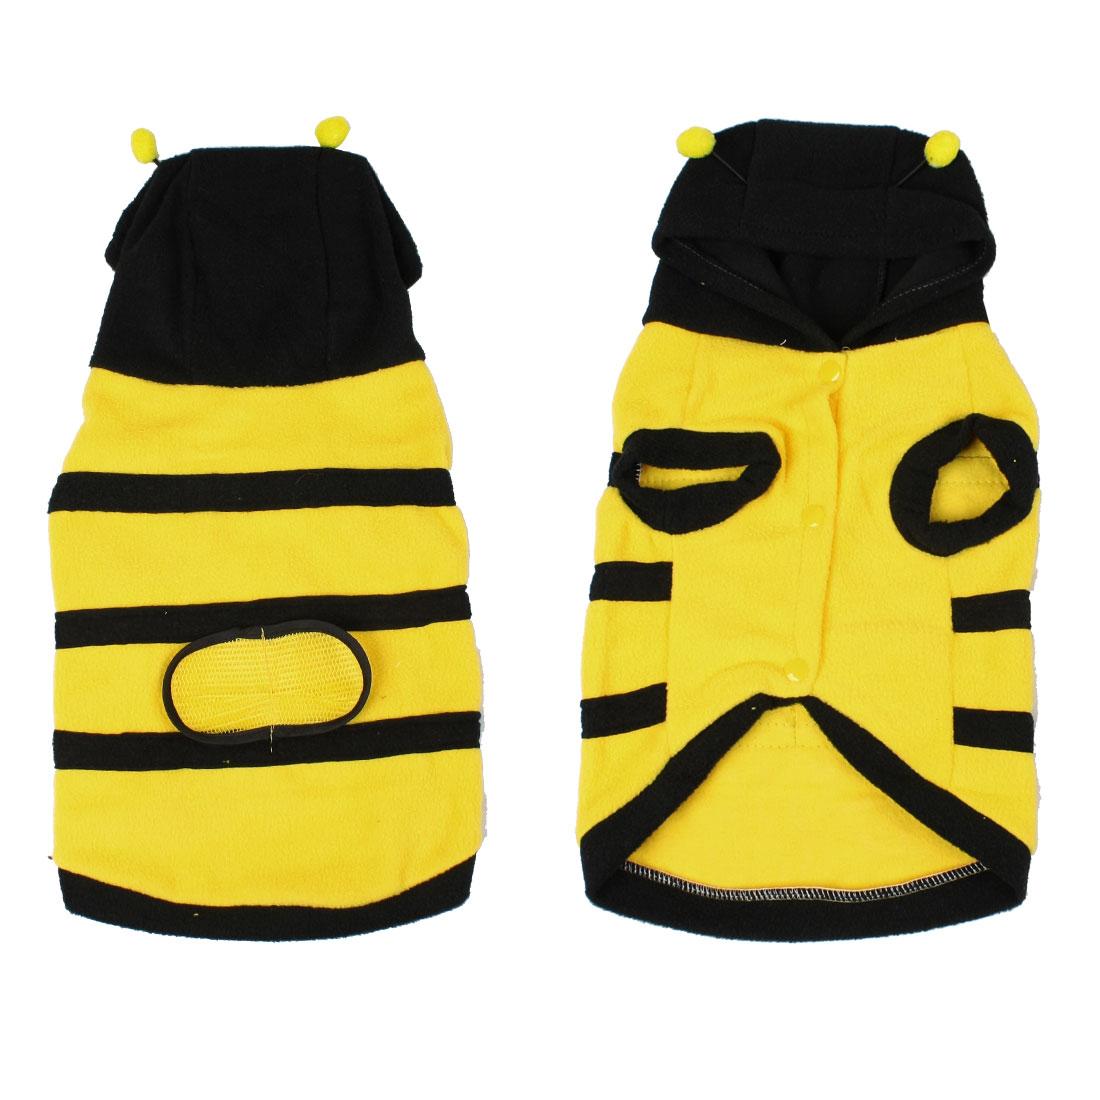 Xmas Costume Yellow Black Fleece Bee Design Hooded Dog Coat Pet Clothes L